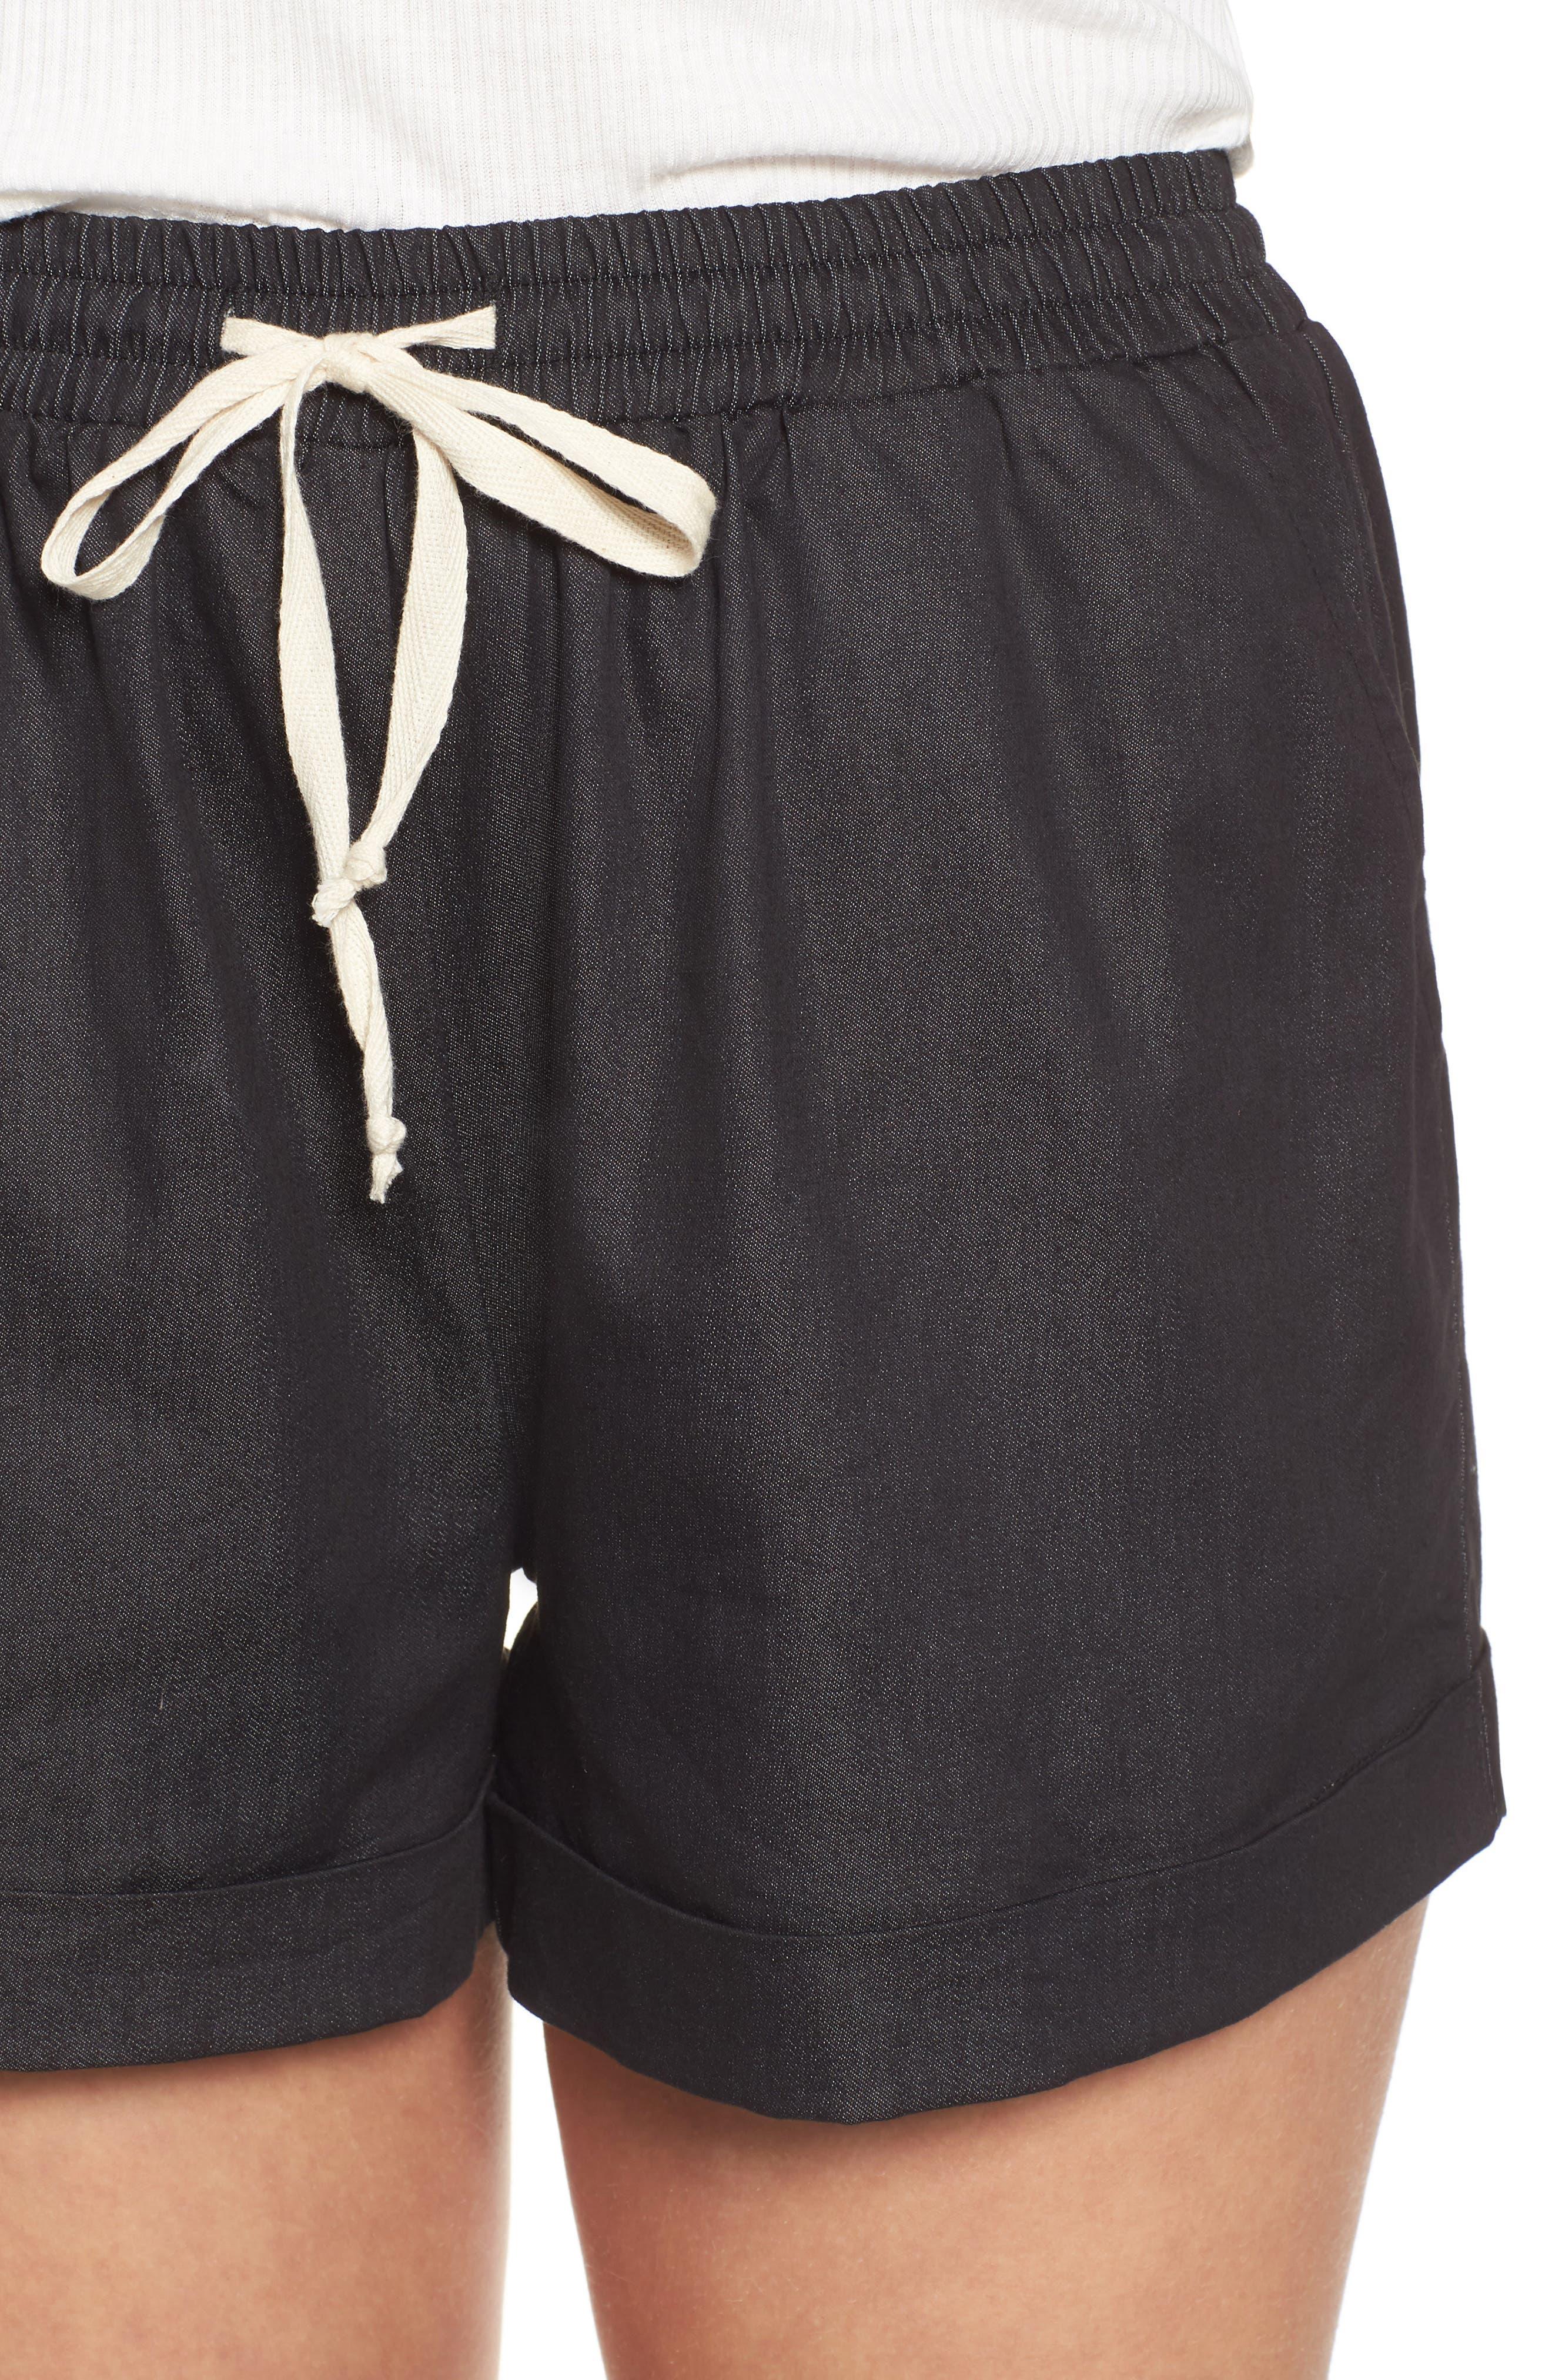 Getaway Shorts,                             Alternate thumbnail 4, color,                             Black